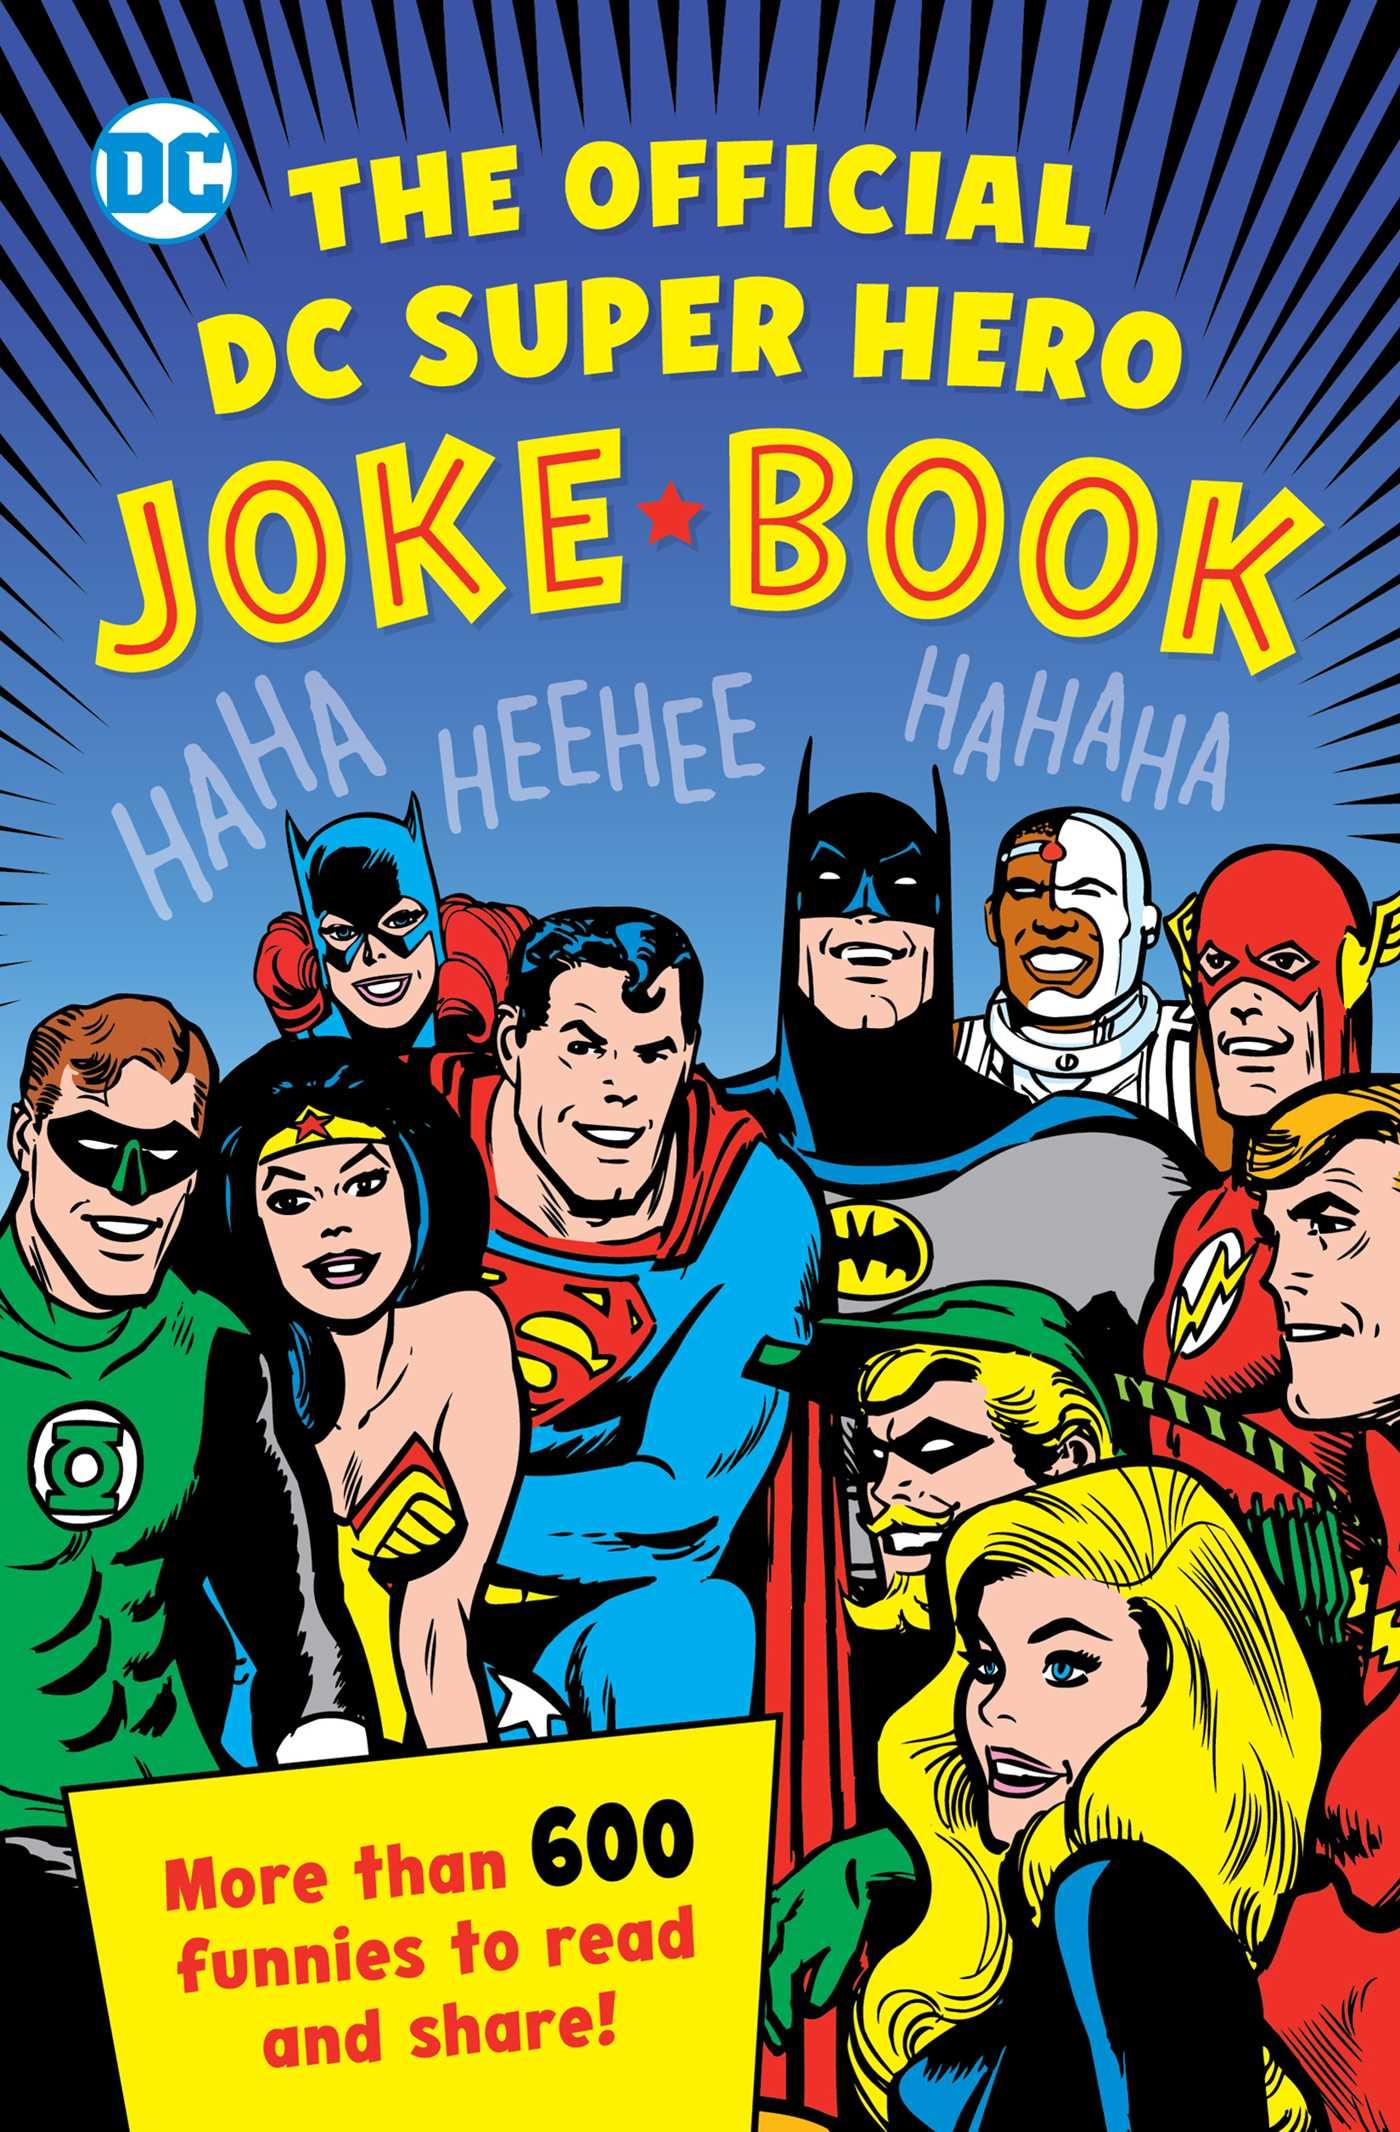 the-official-dc-super-hero-joke-book-9781941367339_hr.jpg